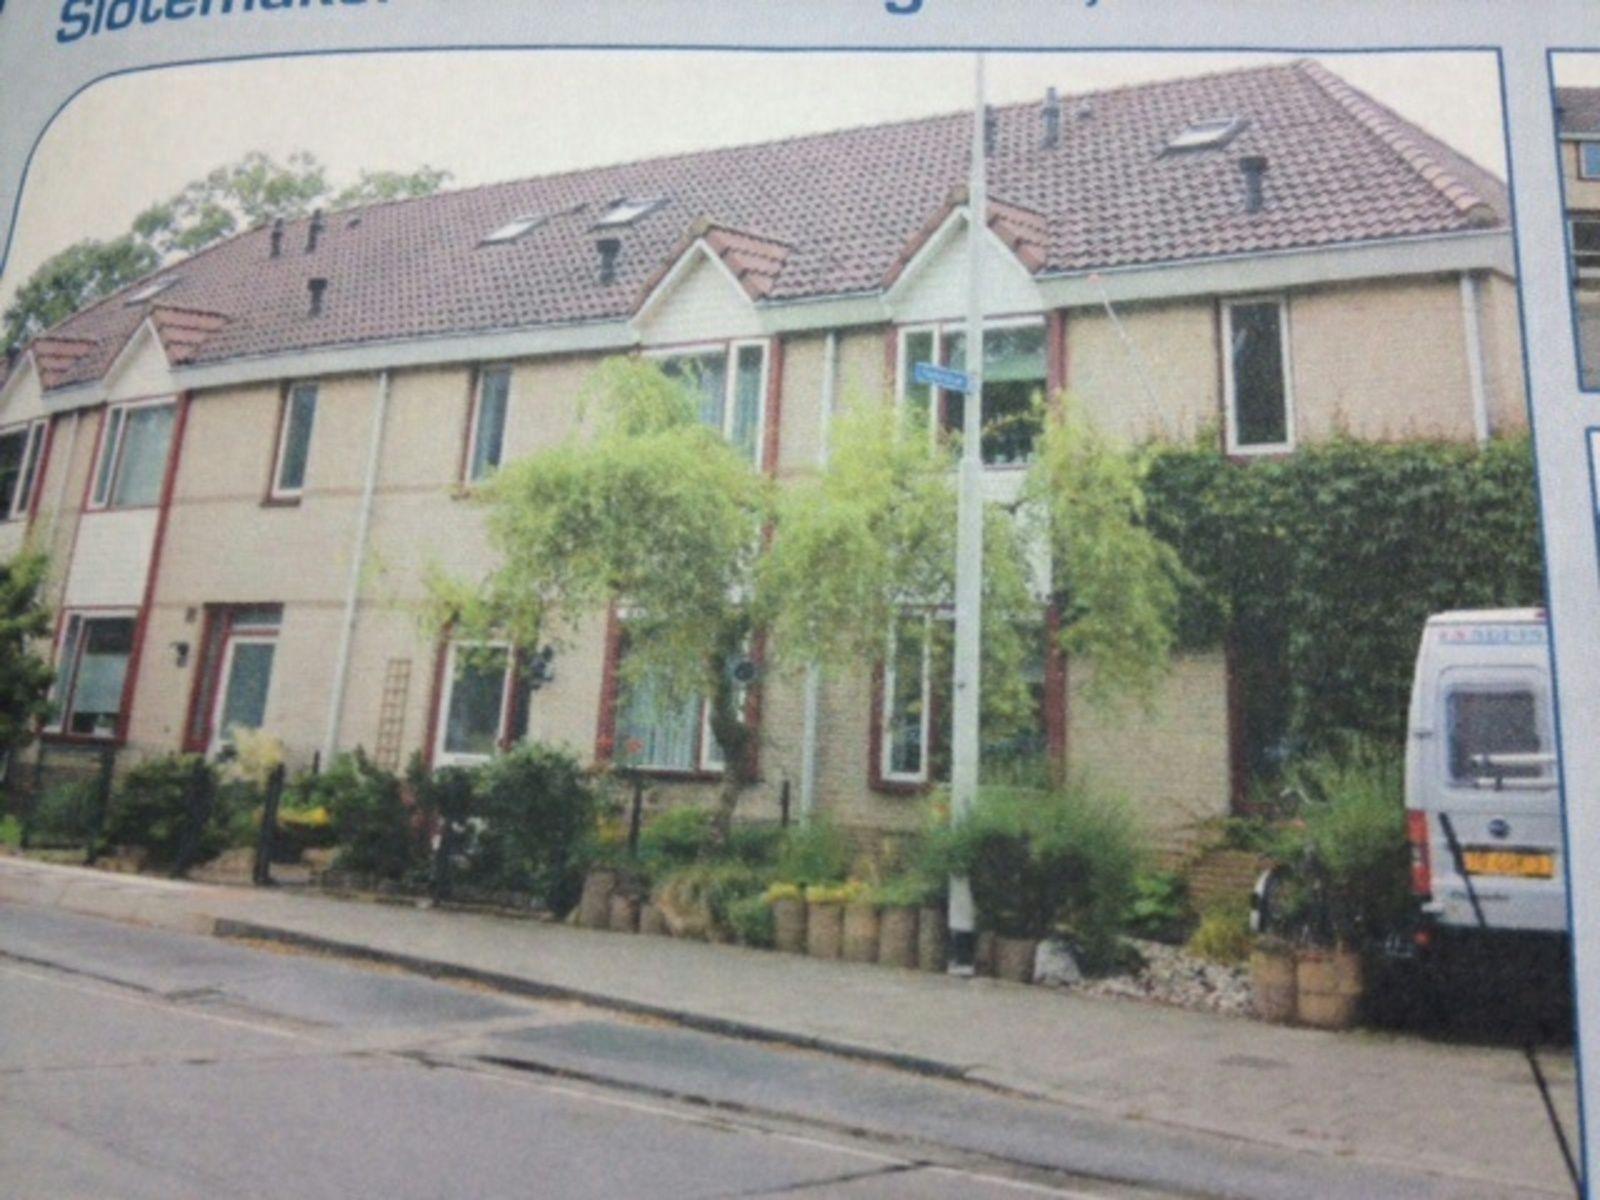 Slotemaker de Bruïneweg 20, Nijmegen